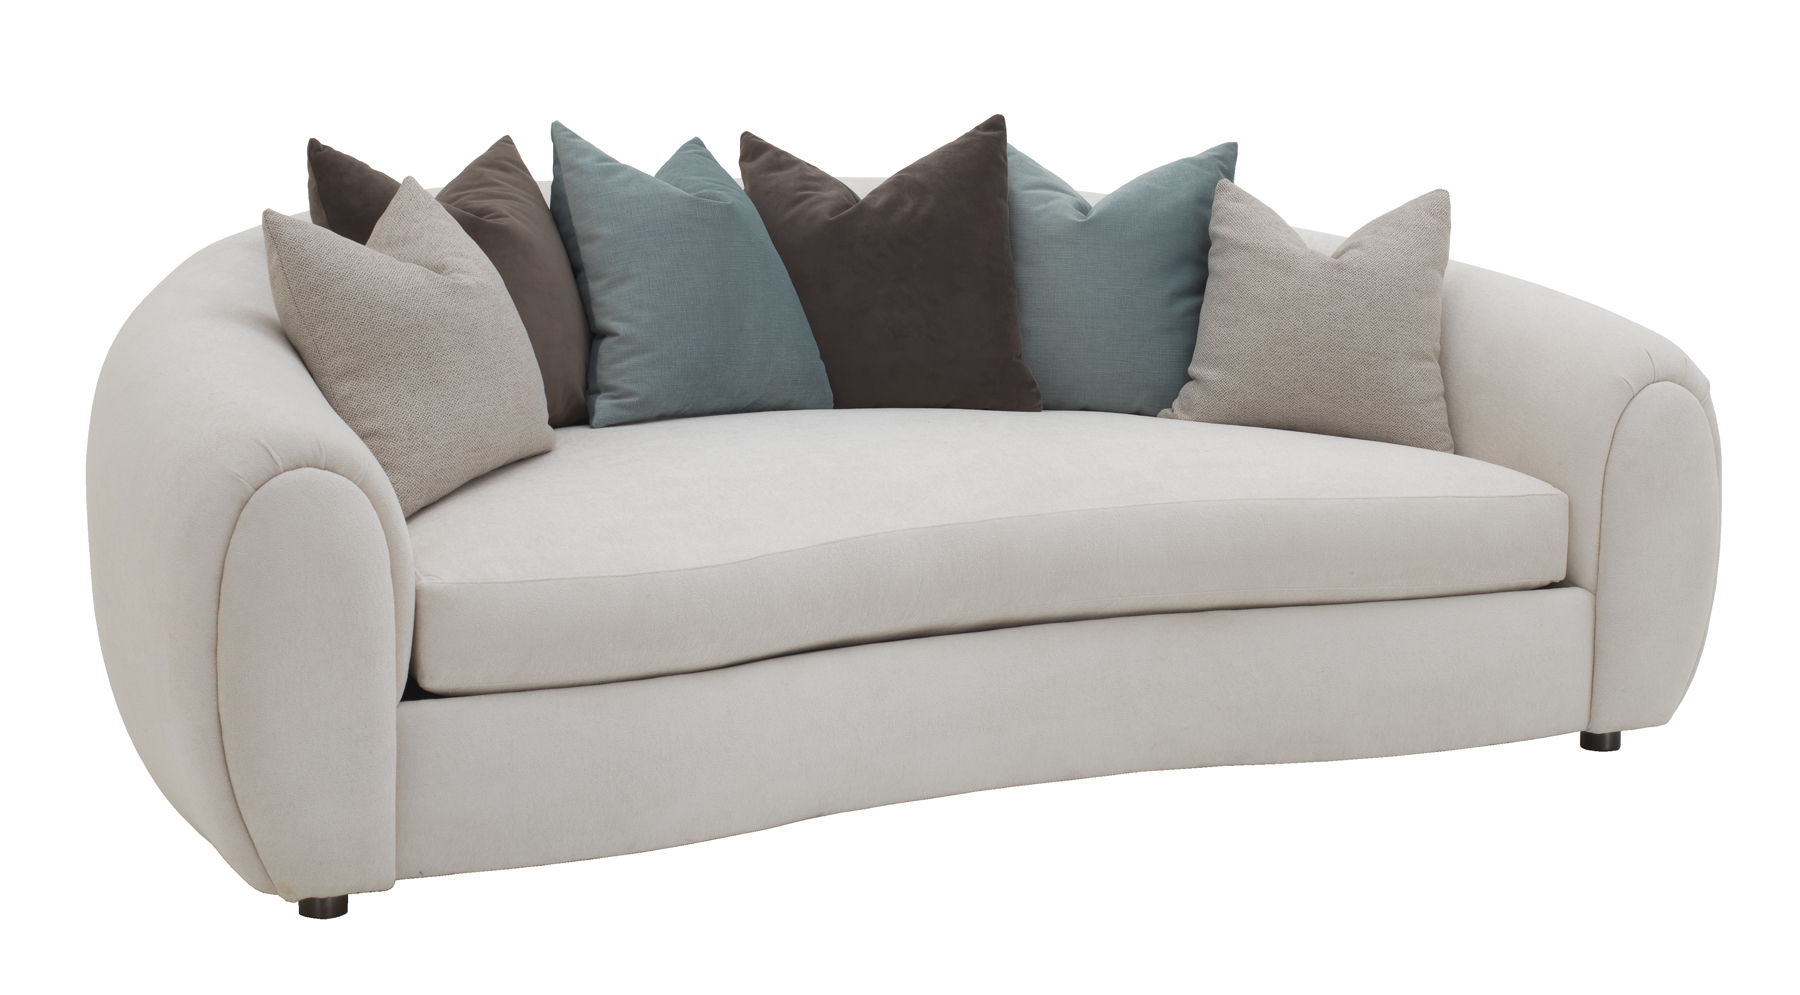 Designers Furniture Glendale New Haven Sofa | Designers Furniture For Haven Sofa Chairs (Image 4 of 25)